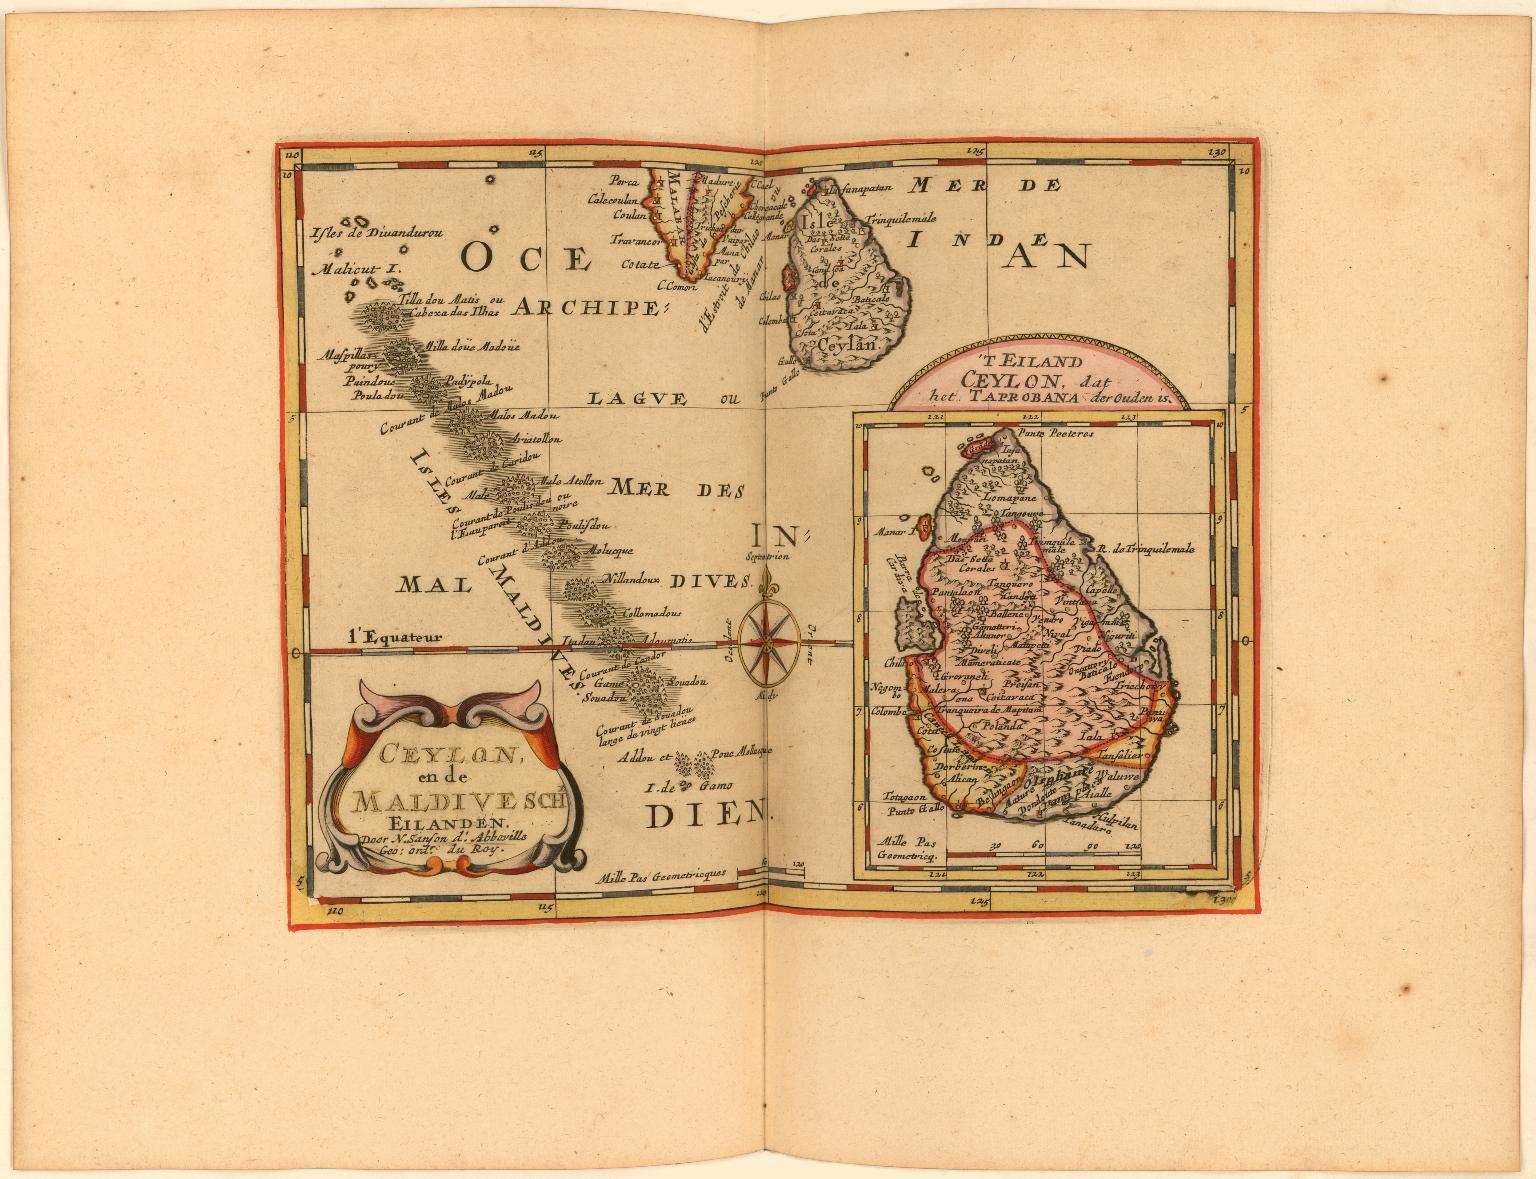 Ceylon en de Madivesche Eilanden. Door N. Sanson d'Abbeville, Geo: ordr. du Roy.